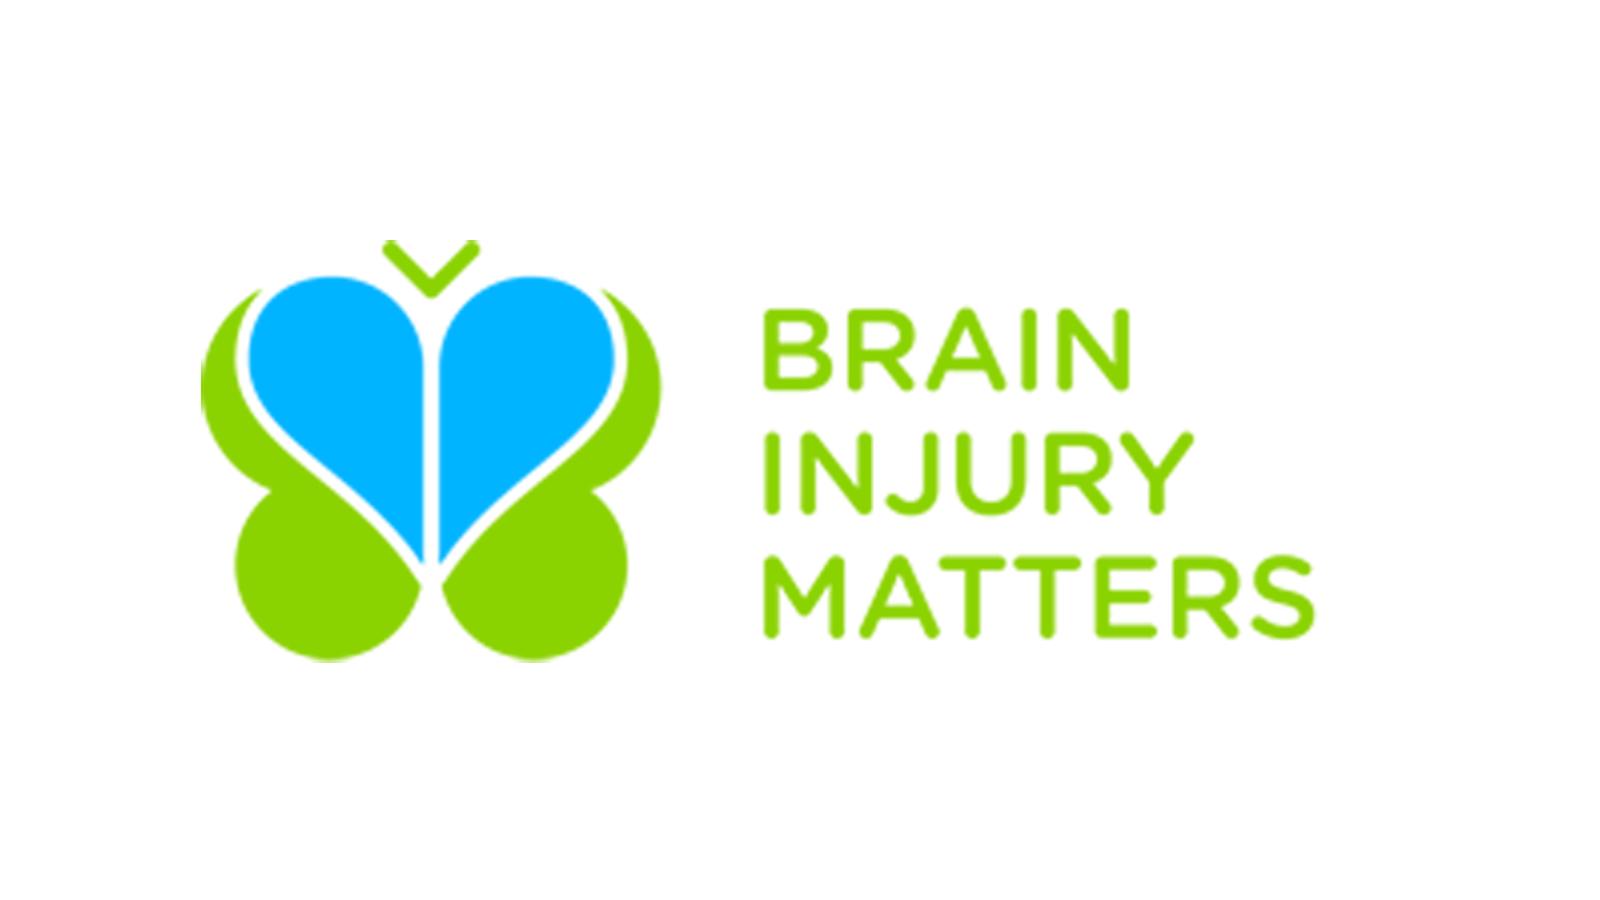 Brain Injury Matters